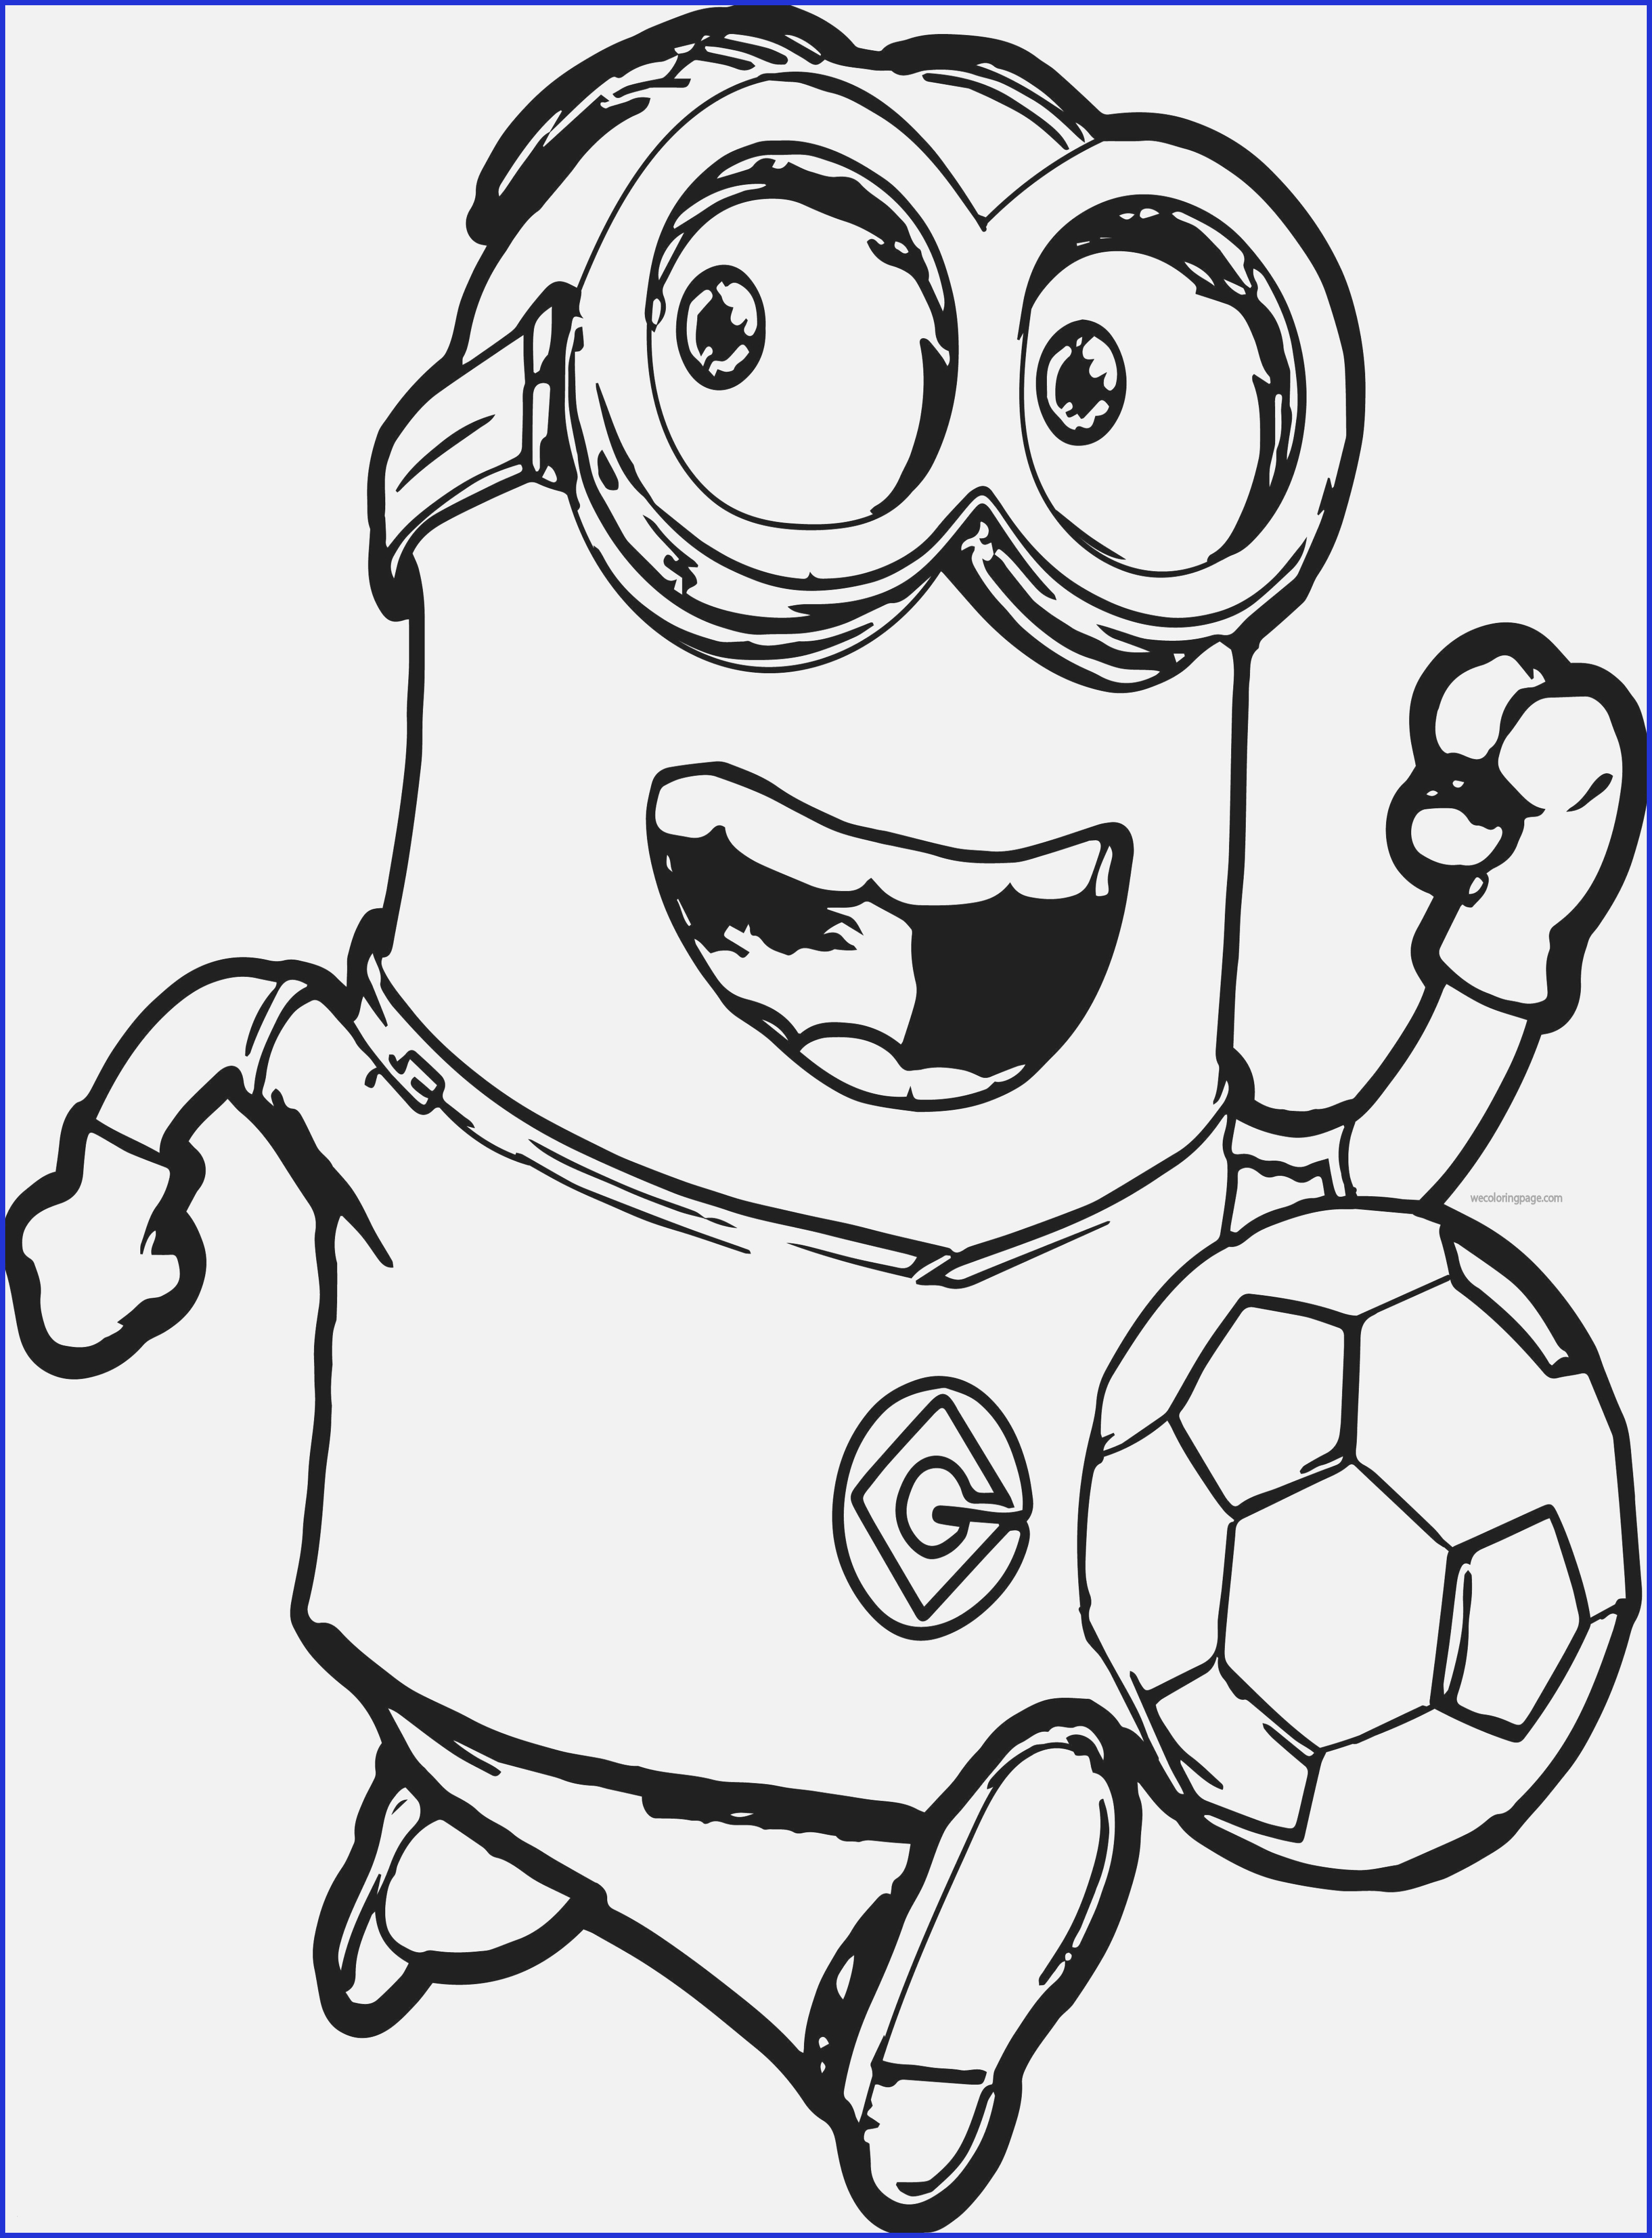 Despicable Coloring Pages Printable Despicable Me Coloring Pages Minion Soccer Player Coloring